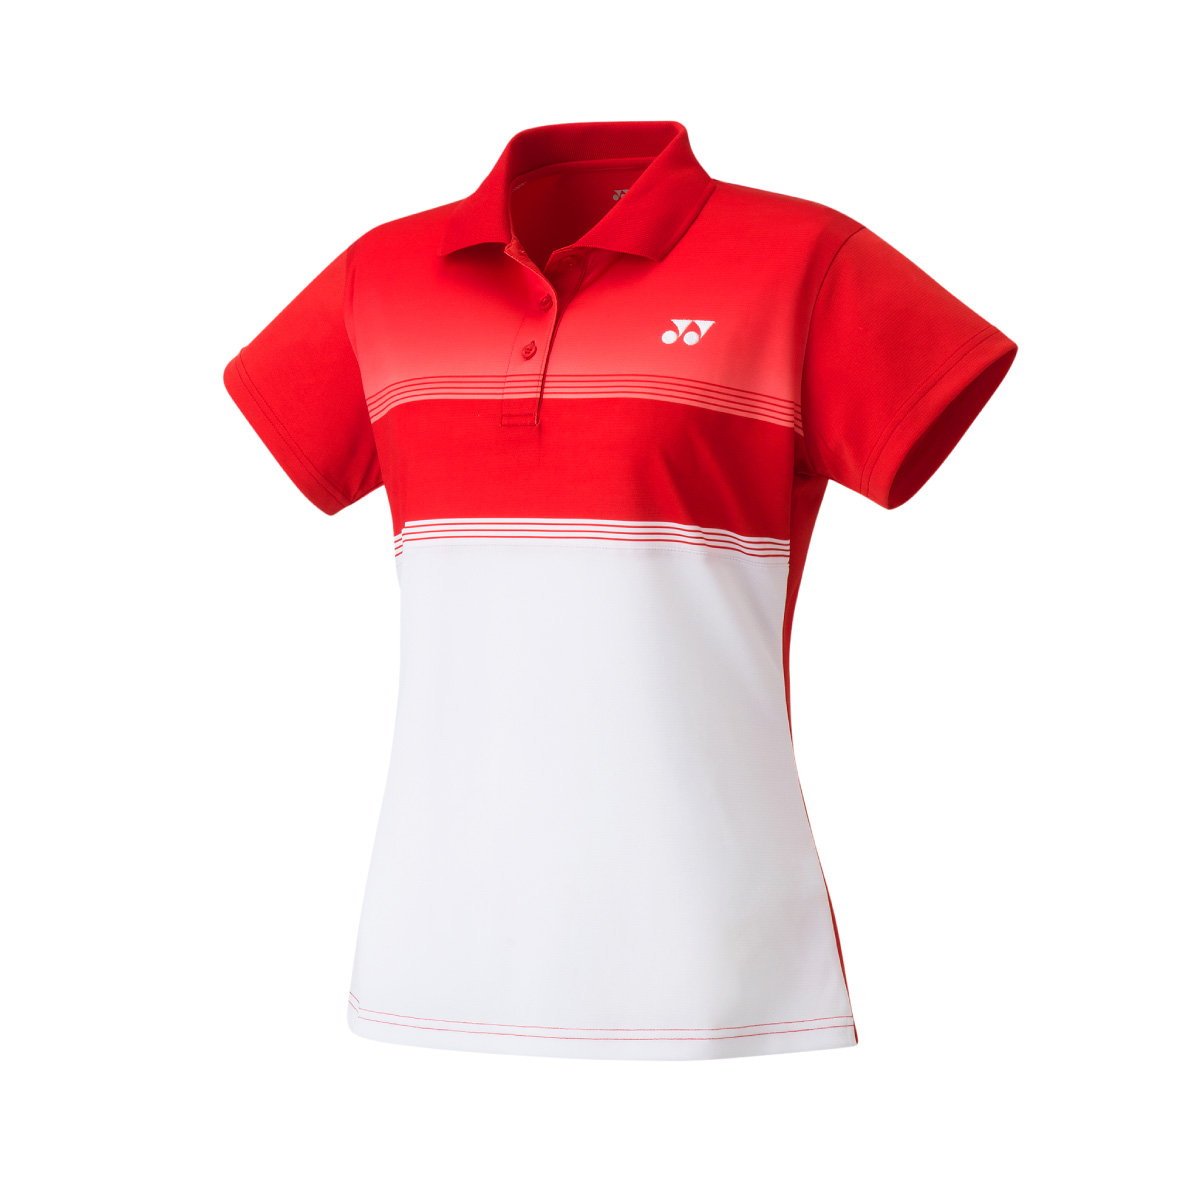 YONEX - Women Polo Shirt, Club Team YW0019Detailbild - 1